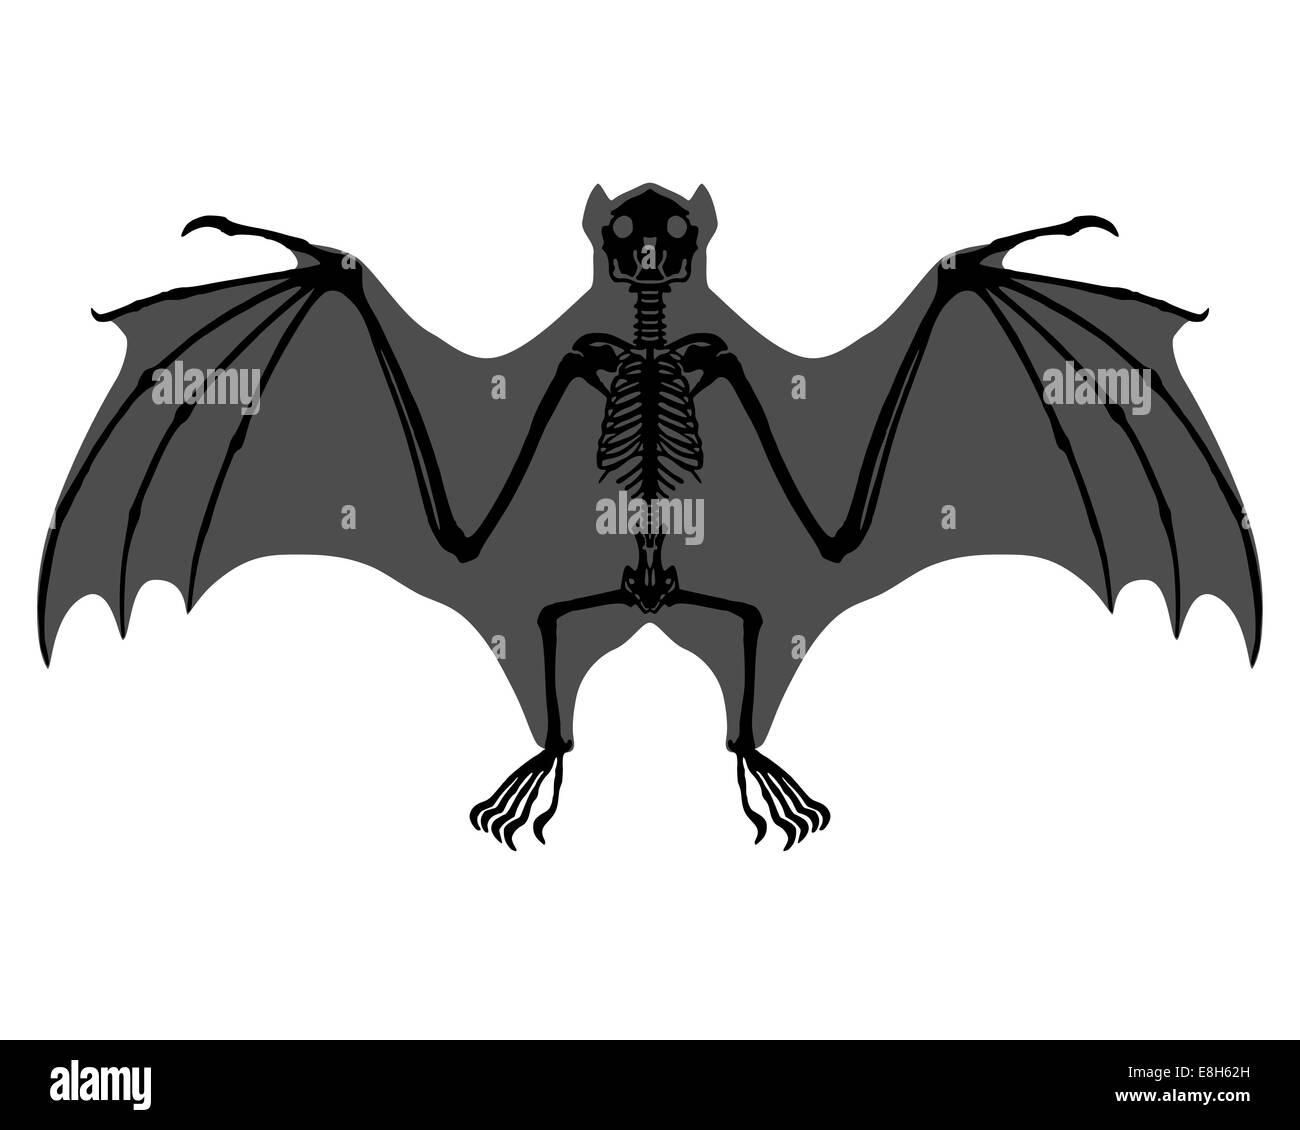 Bat Wing Anatomy Black and White Stock Photos & Images - Alamy